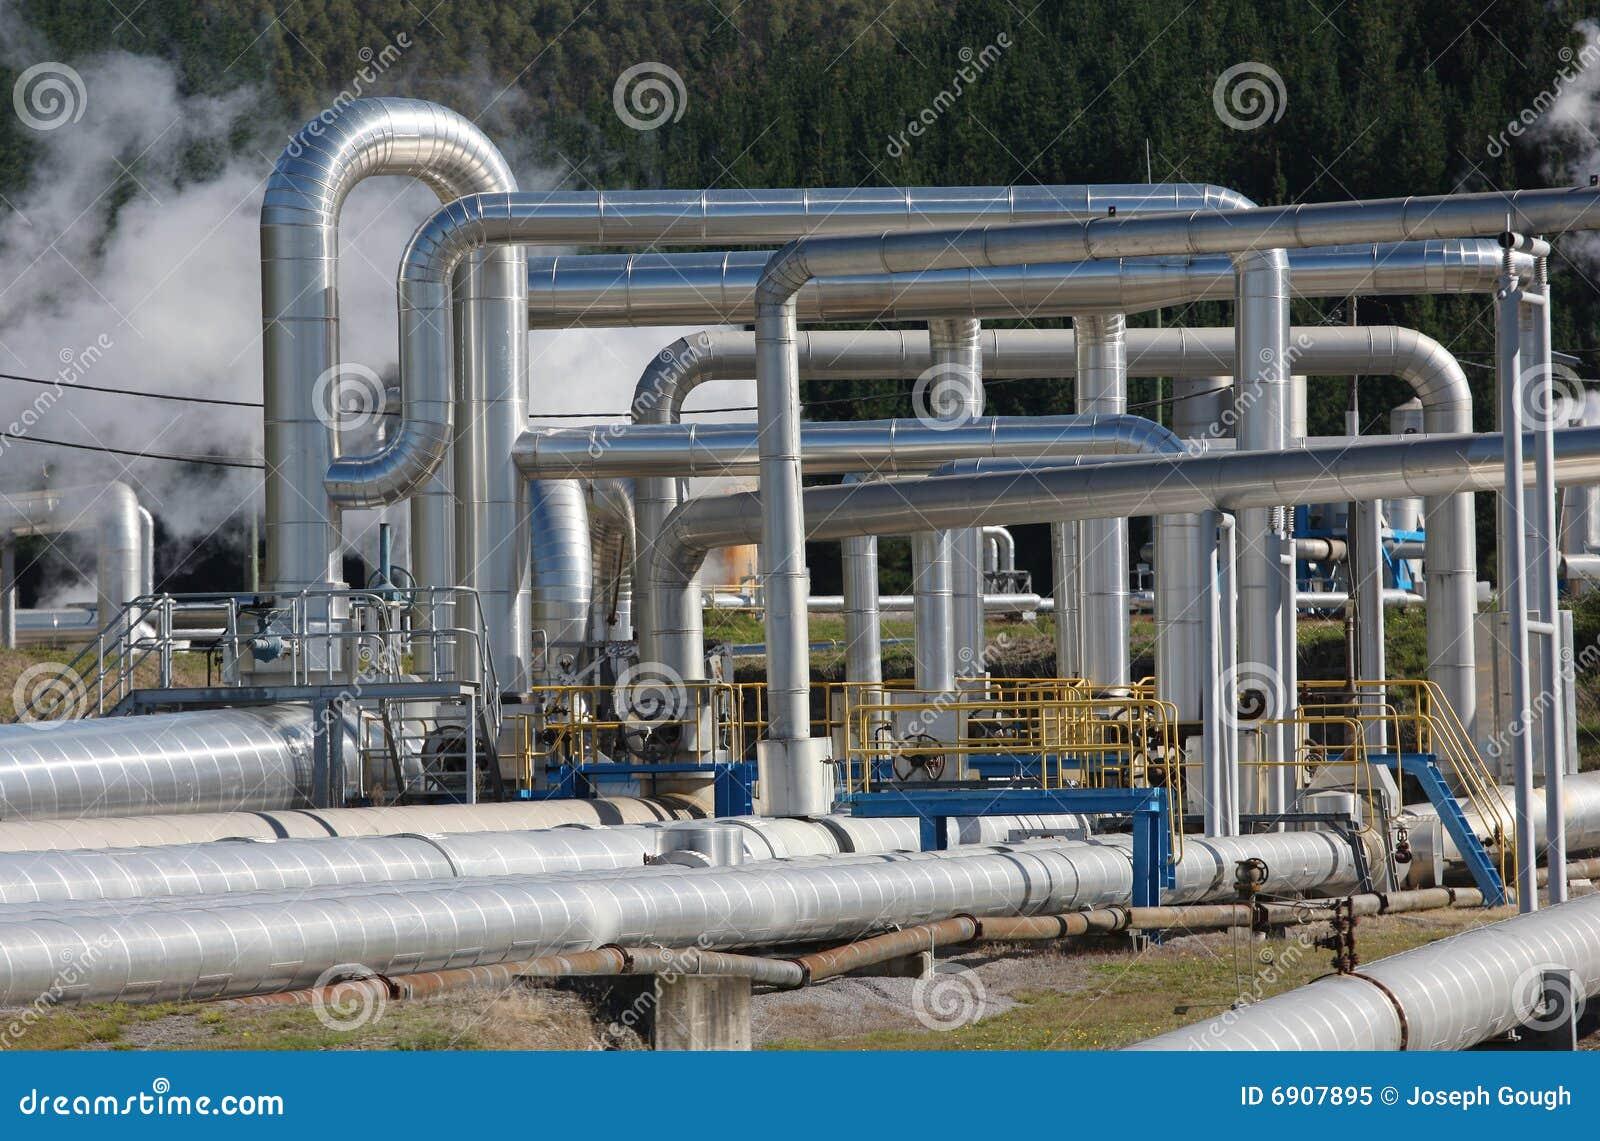 Tubulações de vapor, energia Geothermal